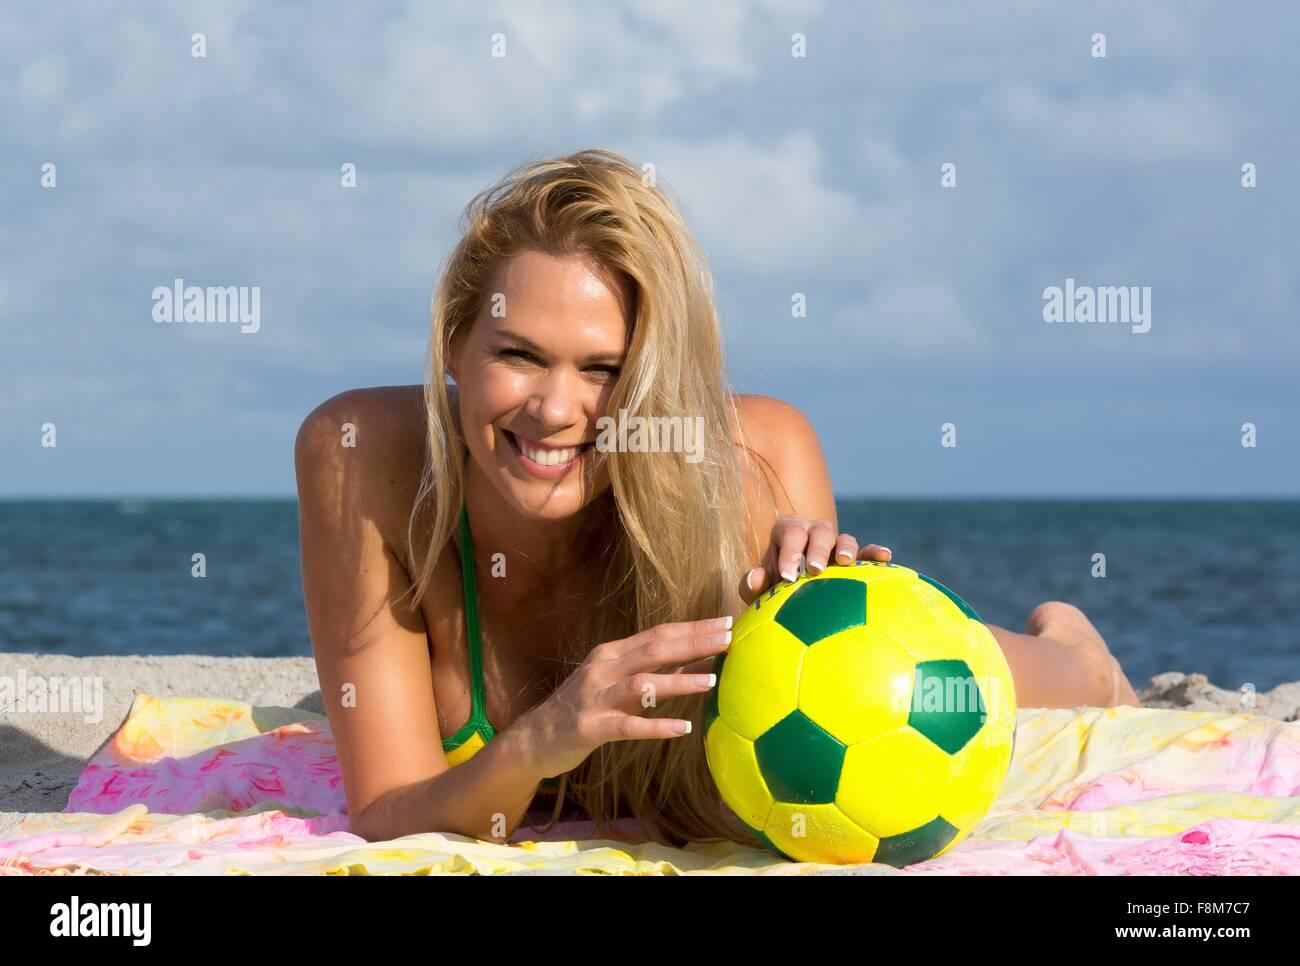 Portrait of woman wearing bikini lying on beach with soccer ball, Miami Beach, Florida, USA - Stock Image